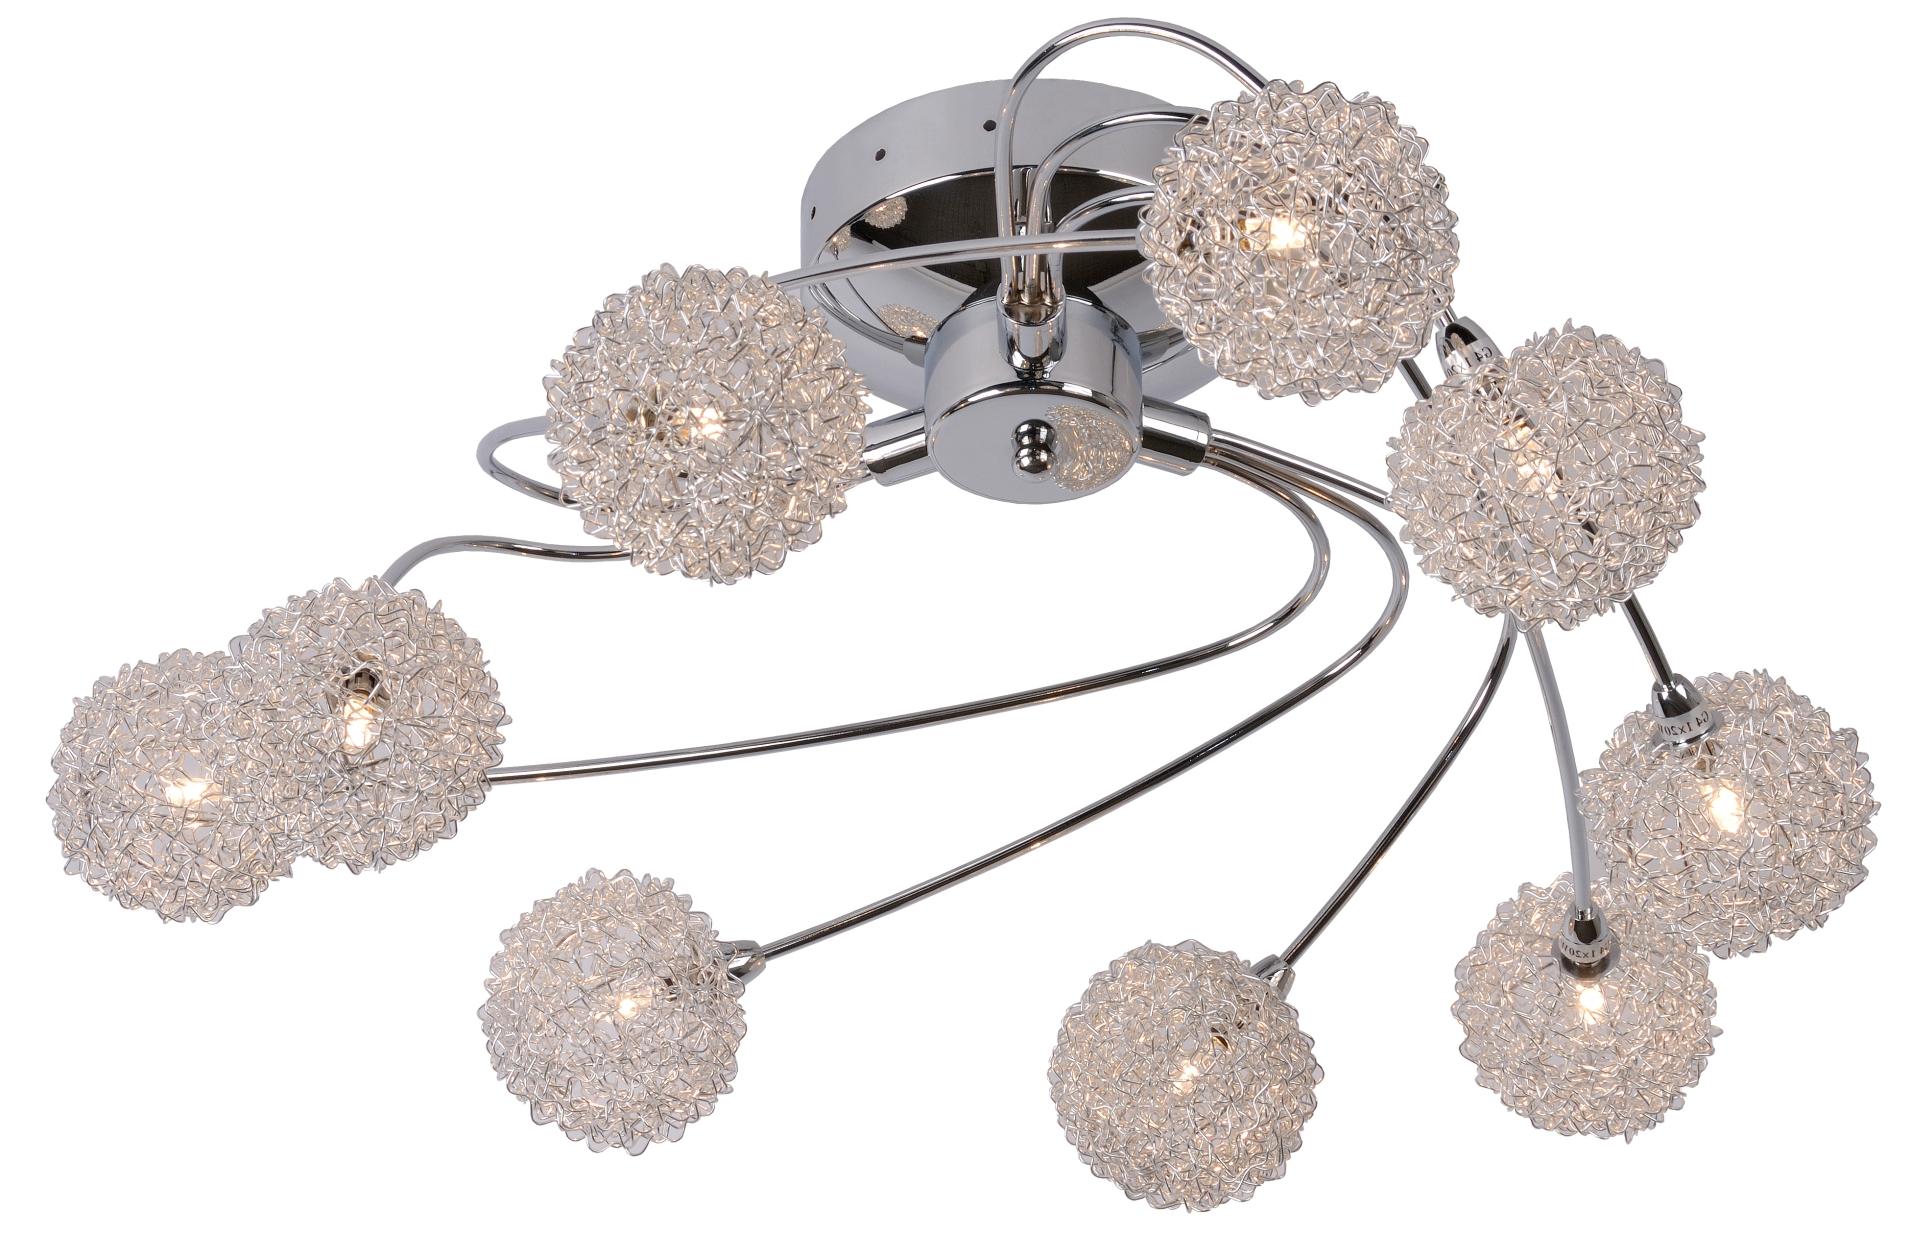 Lucide Plafondlamp Rhea - 9 x 20W - Ø68cm - H27.5cm - Chroom